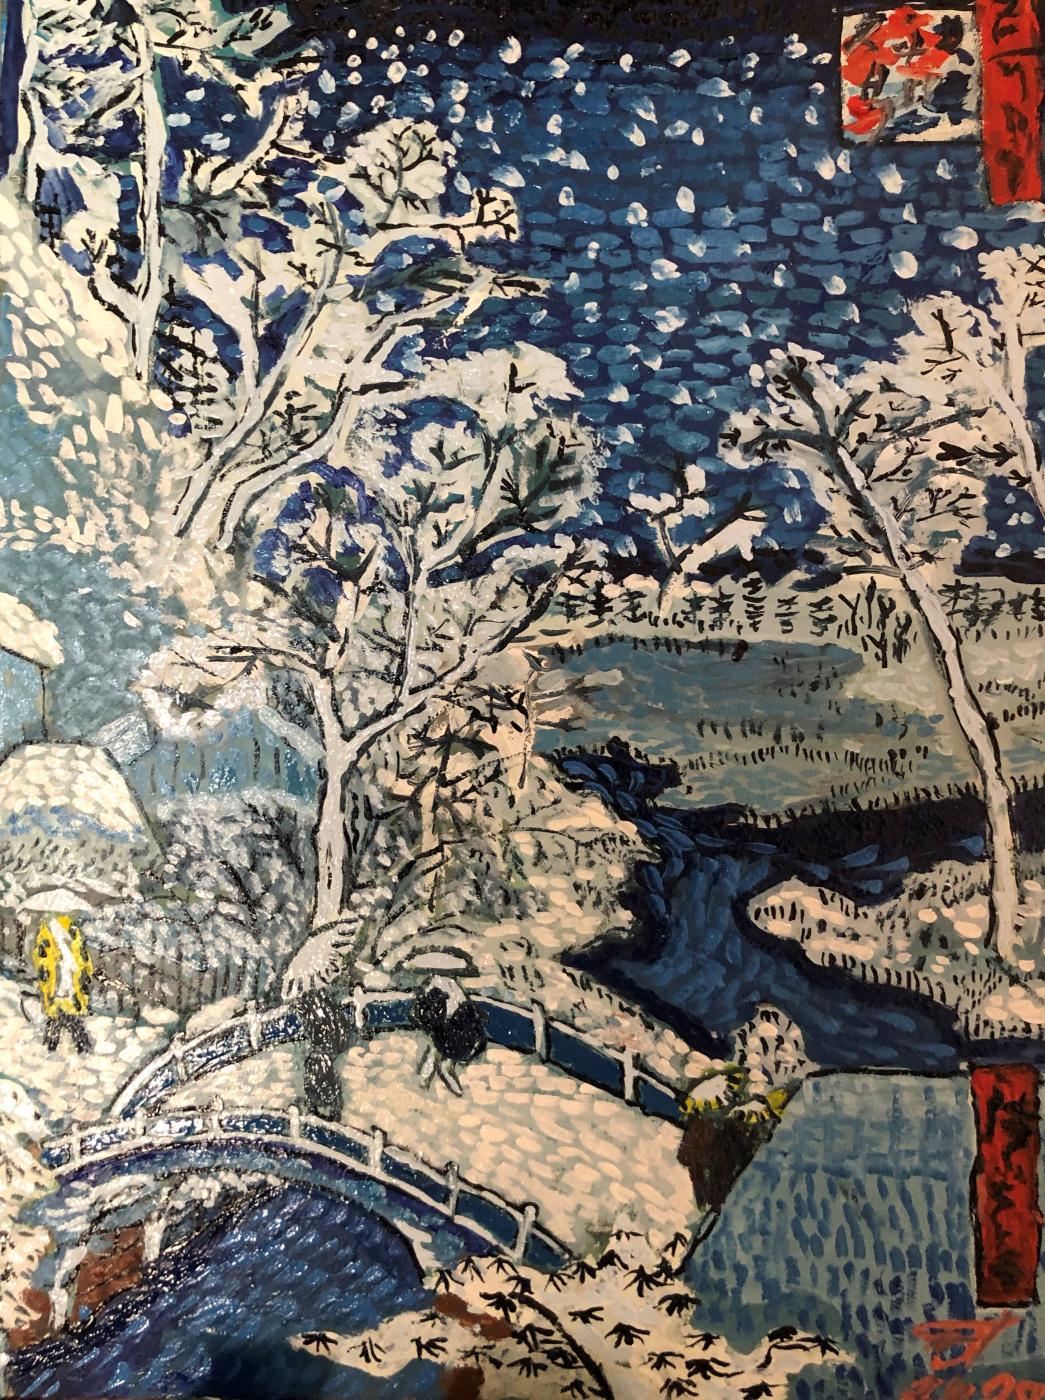 "Sergey Vladimirovich Sebini. If someone is hot. A variation on the theme of Utagawa Hirosege in Meguro on a snowy evening """